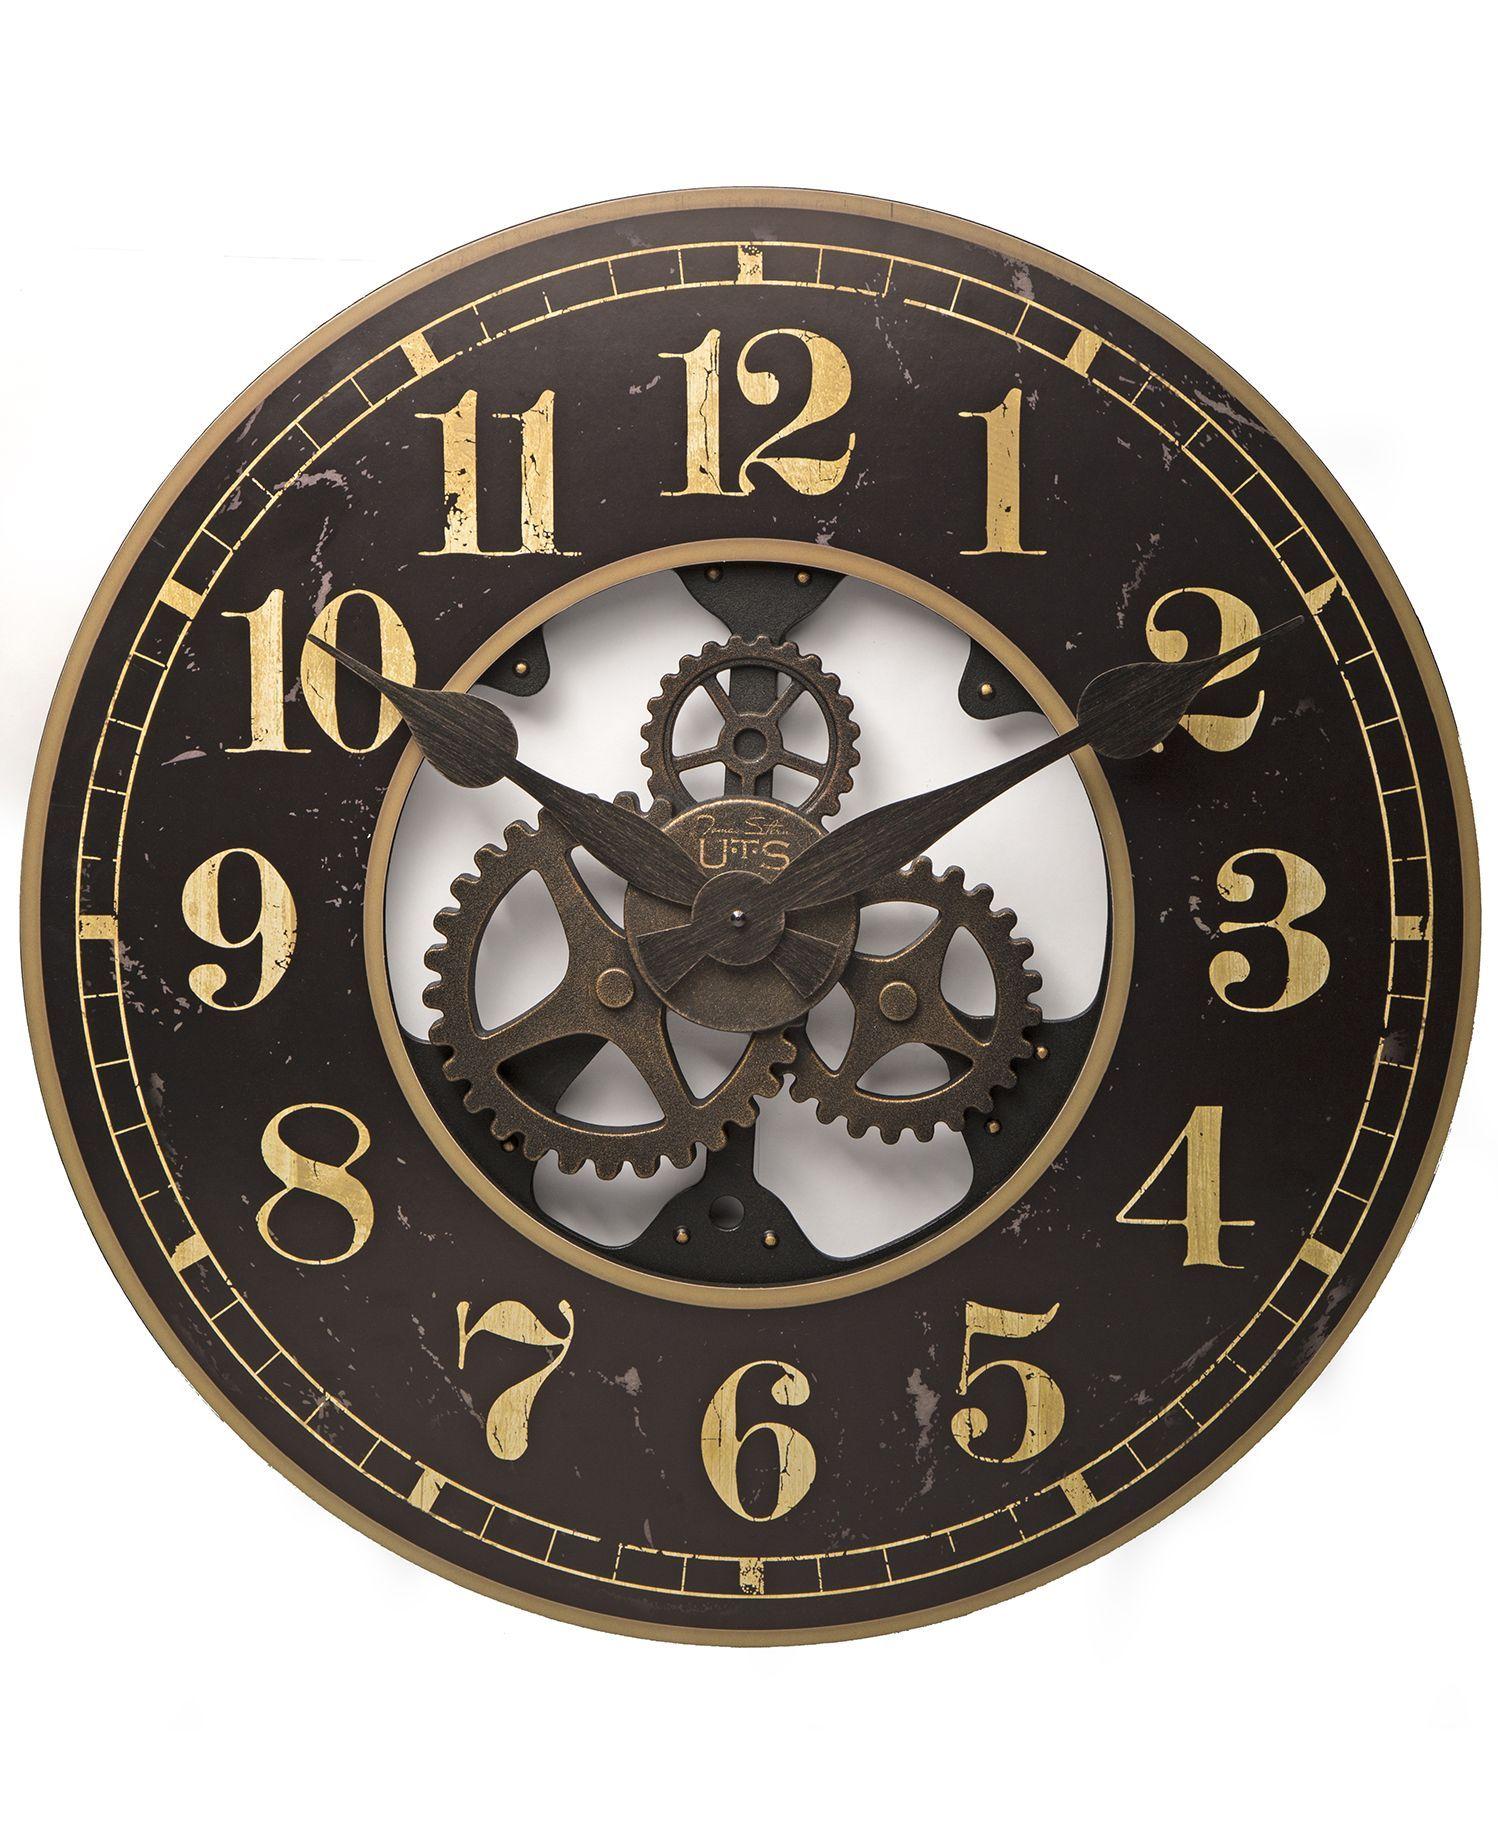 Часы настенные Часы настенные Tomas Stern 9016 chasy-nastennye-tomas-stern-9016-germaniya.jpg